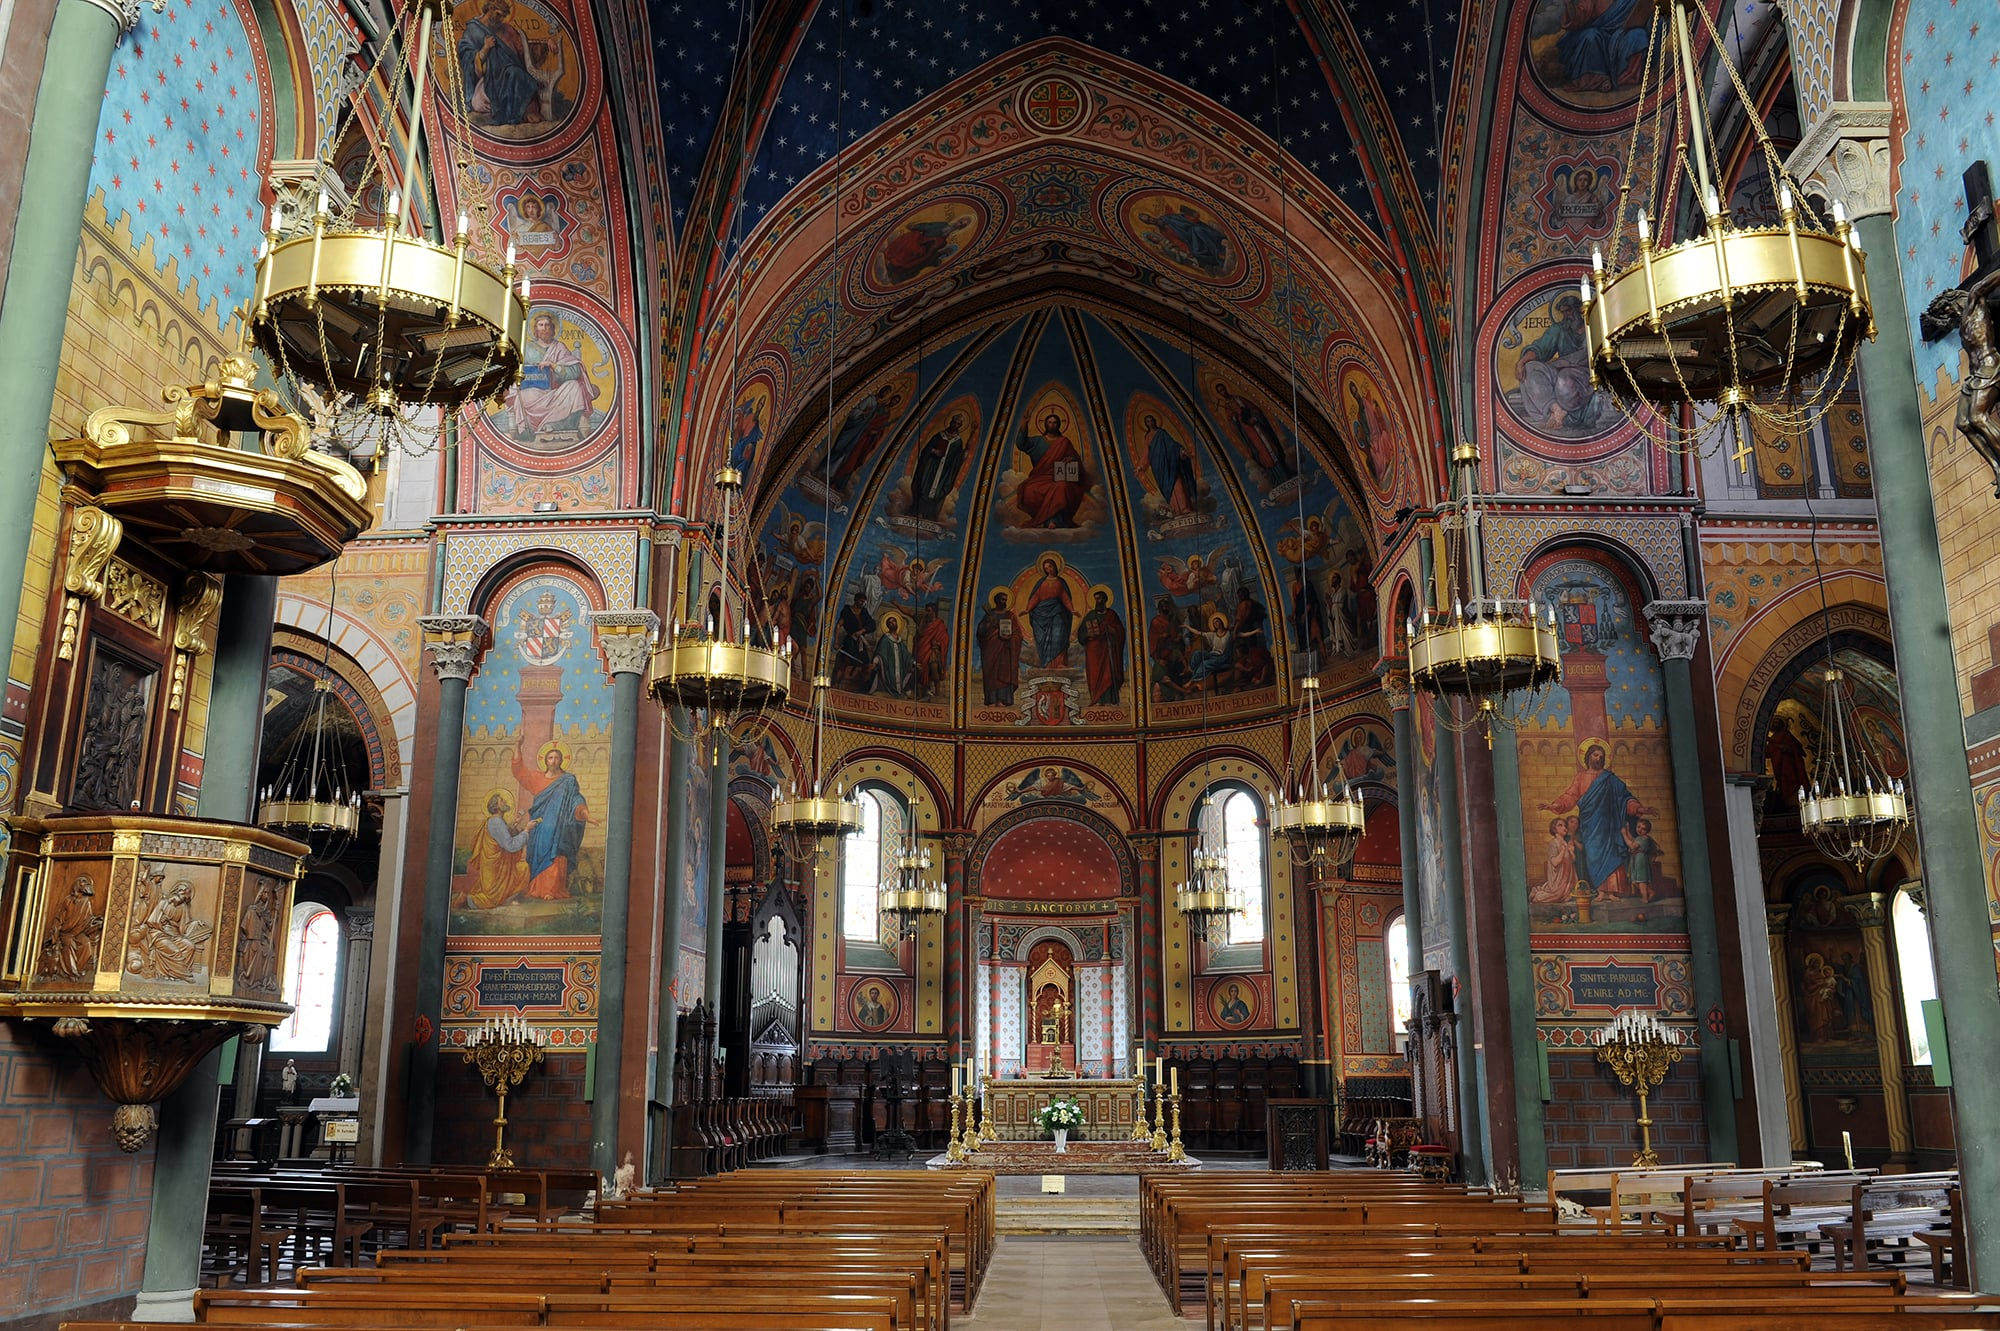 Cathédrale Saint-Caprais©ACIR / JJ Gelbart